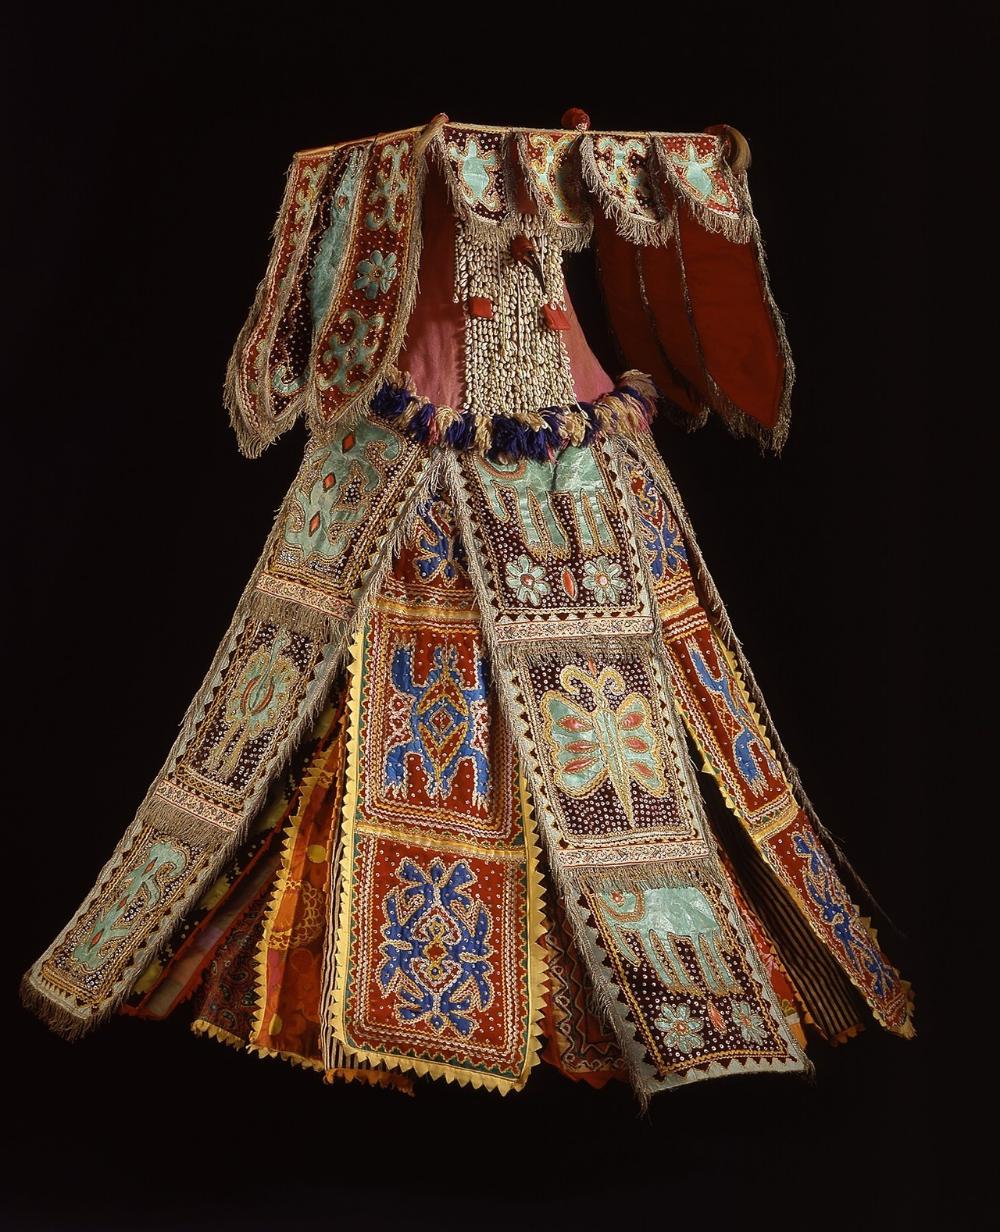 Egungun Masquerade Costume Culture: Yoruba People